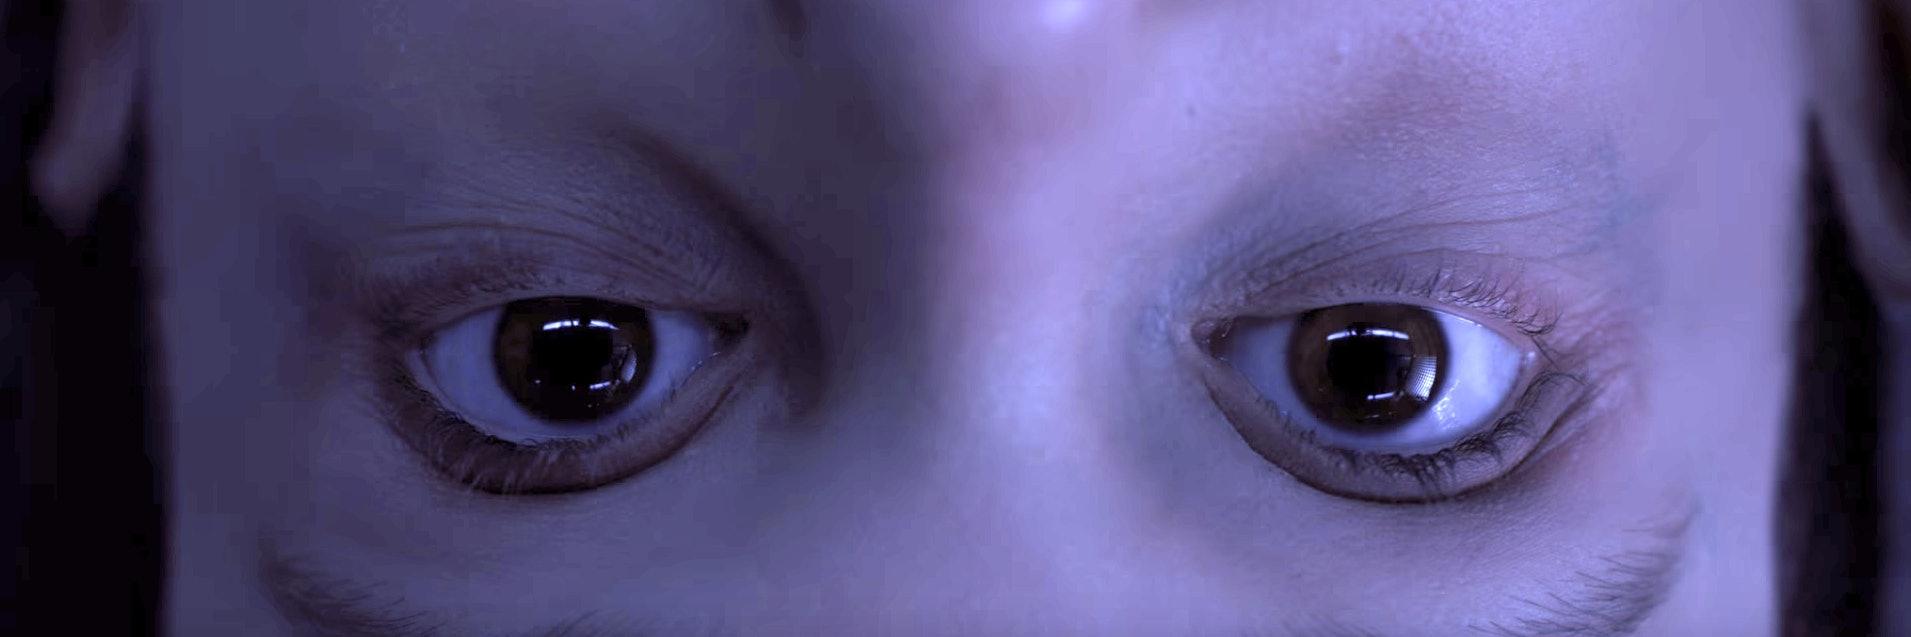 Stranger Things Season 2 Netflix Super Bowl Trailer